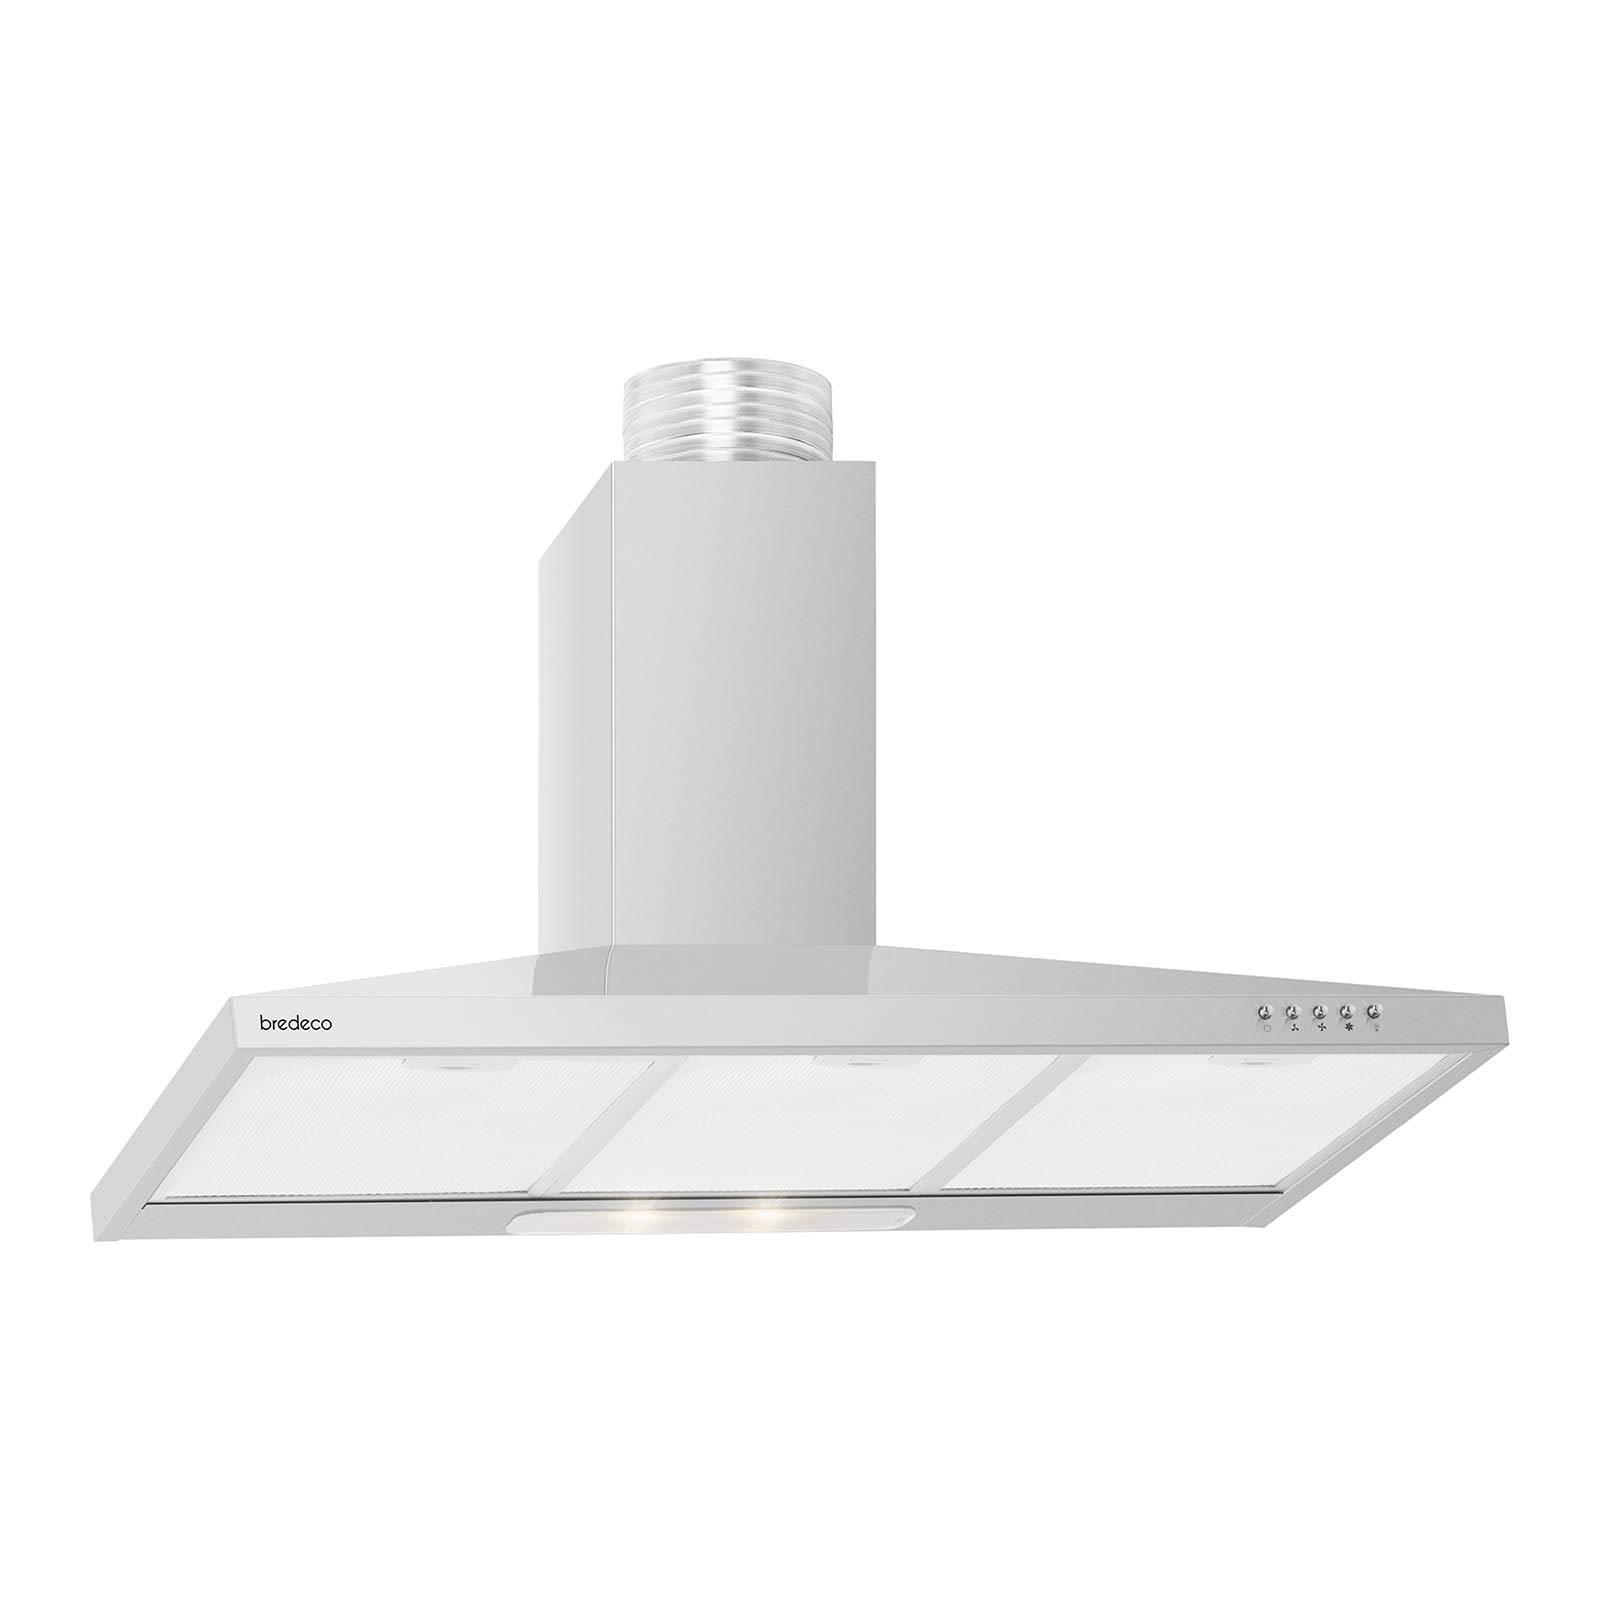 bredeco Campana De Pared Para Cocina BCCH-115D-90E (Iluminación LED, Filtros de grasa reemplazables, Nivel de ruido de 63 dB, 328,7 m³/h, 90 cm): Amazon.es: Grandes electrodomésticos